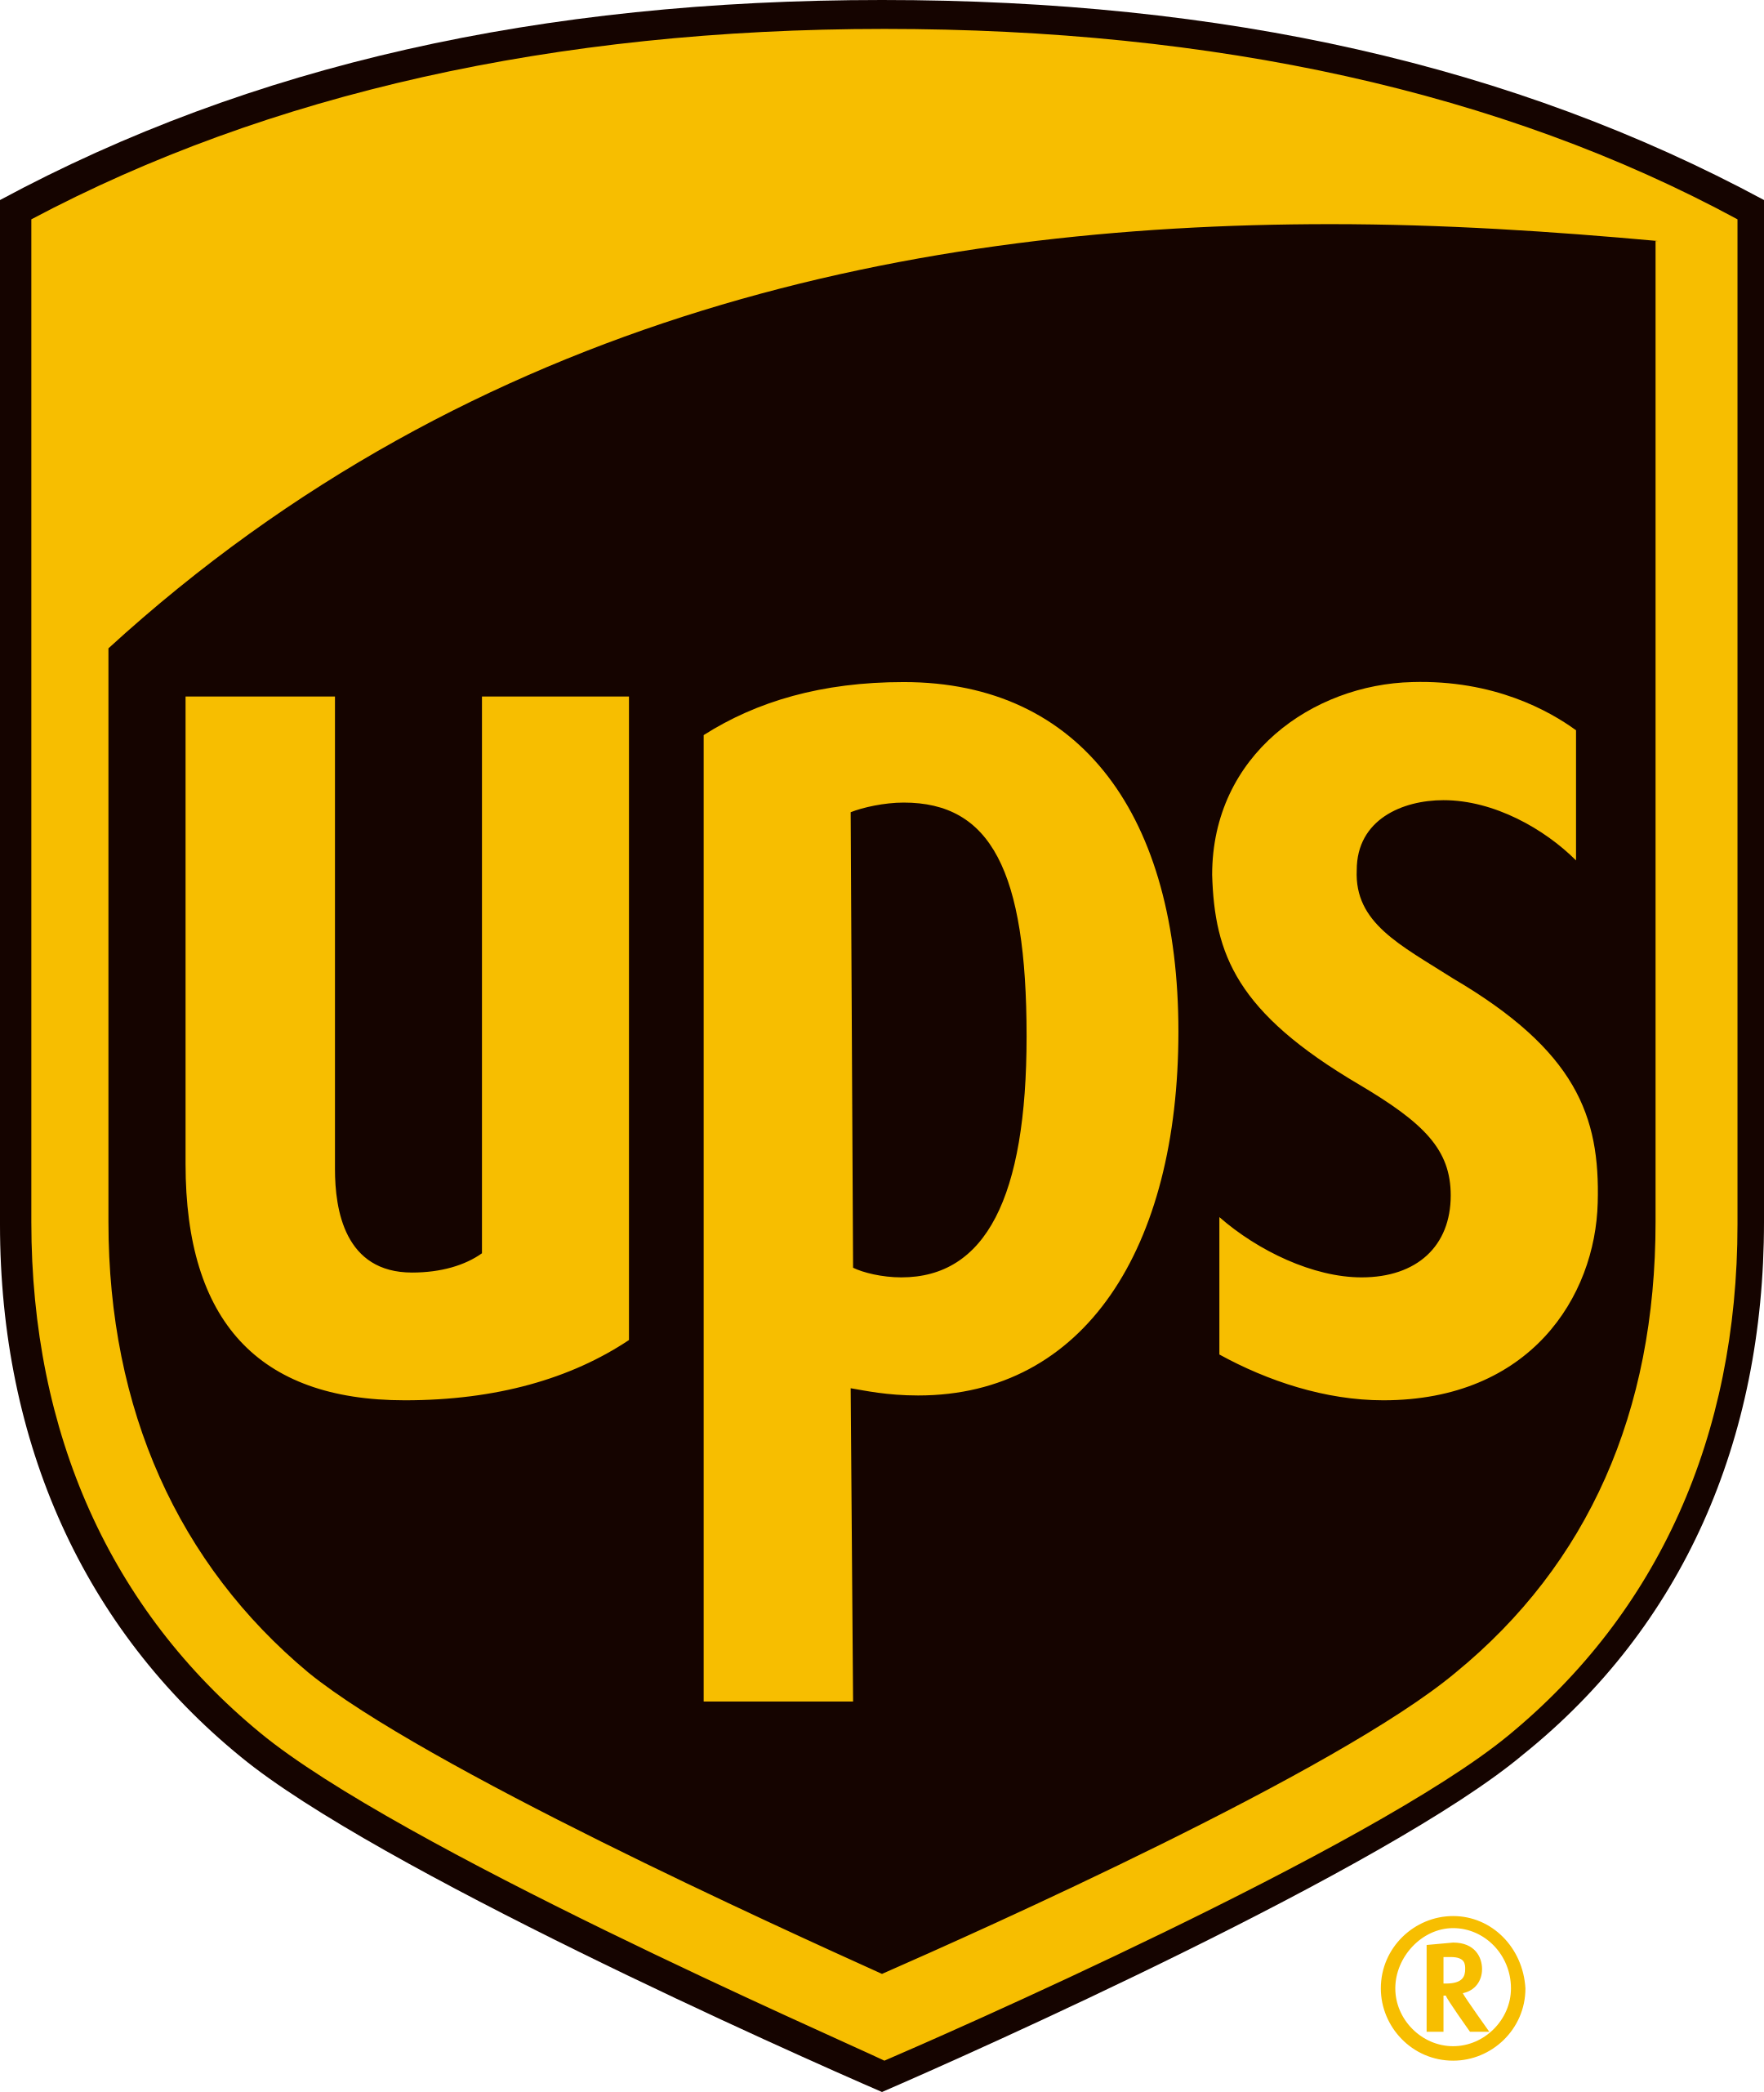 ups logo 1 1 - UPS Logo